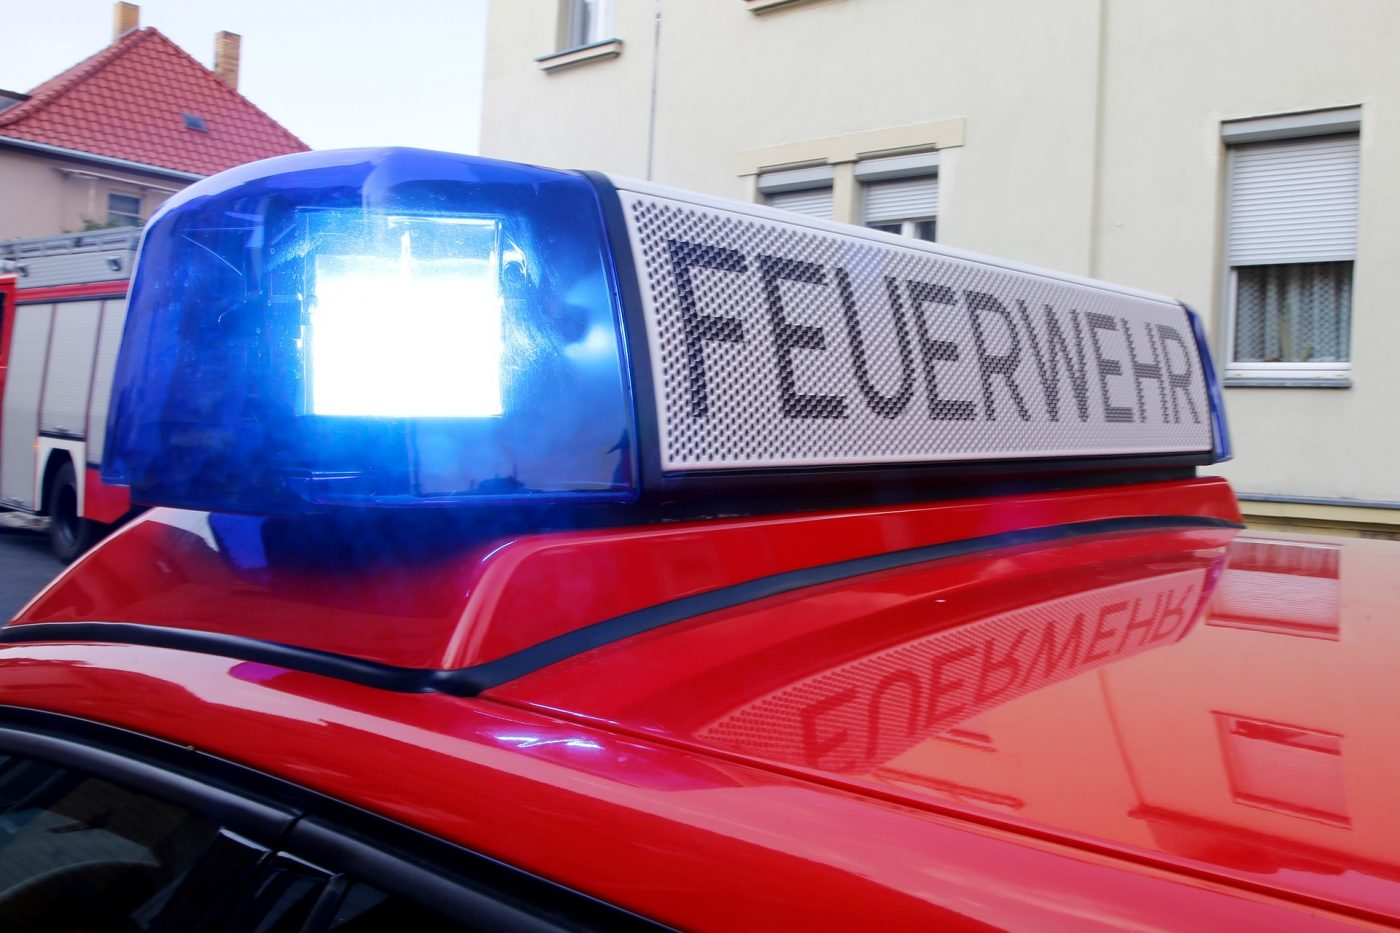 Verkehrsinfo Mecklenburg-Vorpommern Aktuell